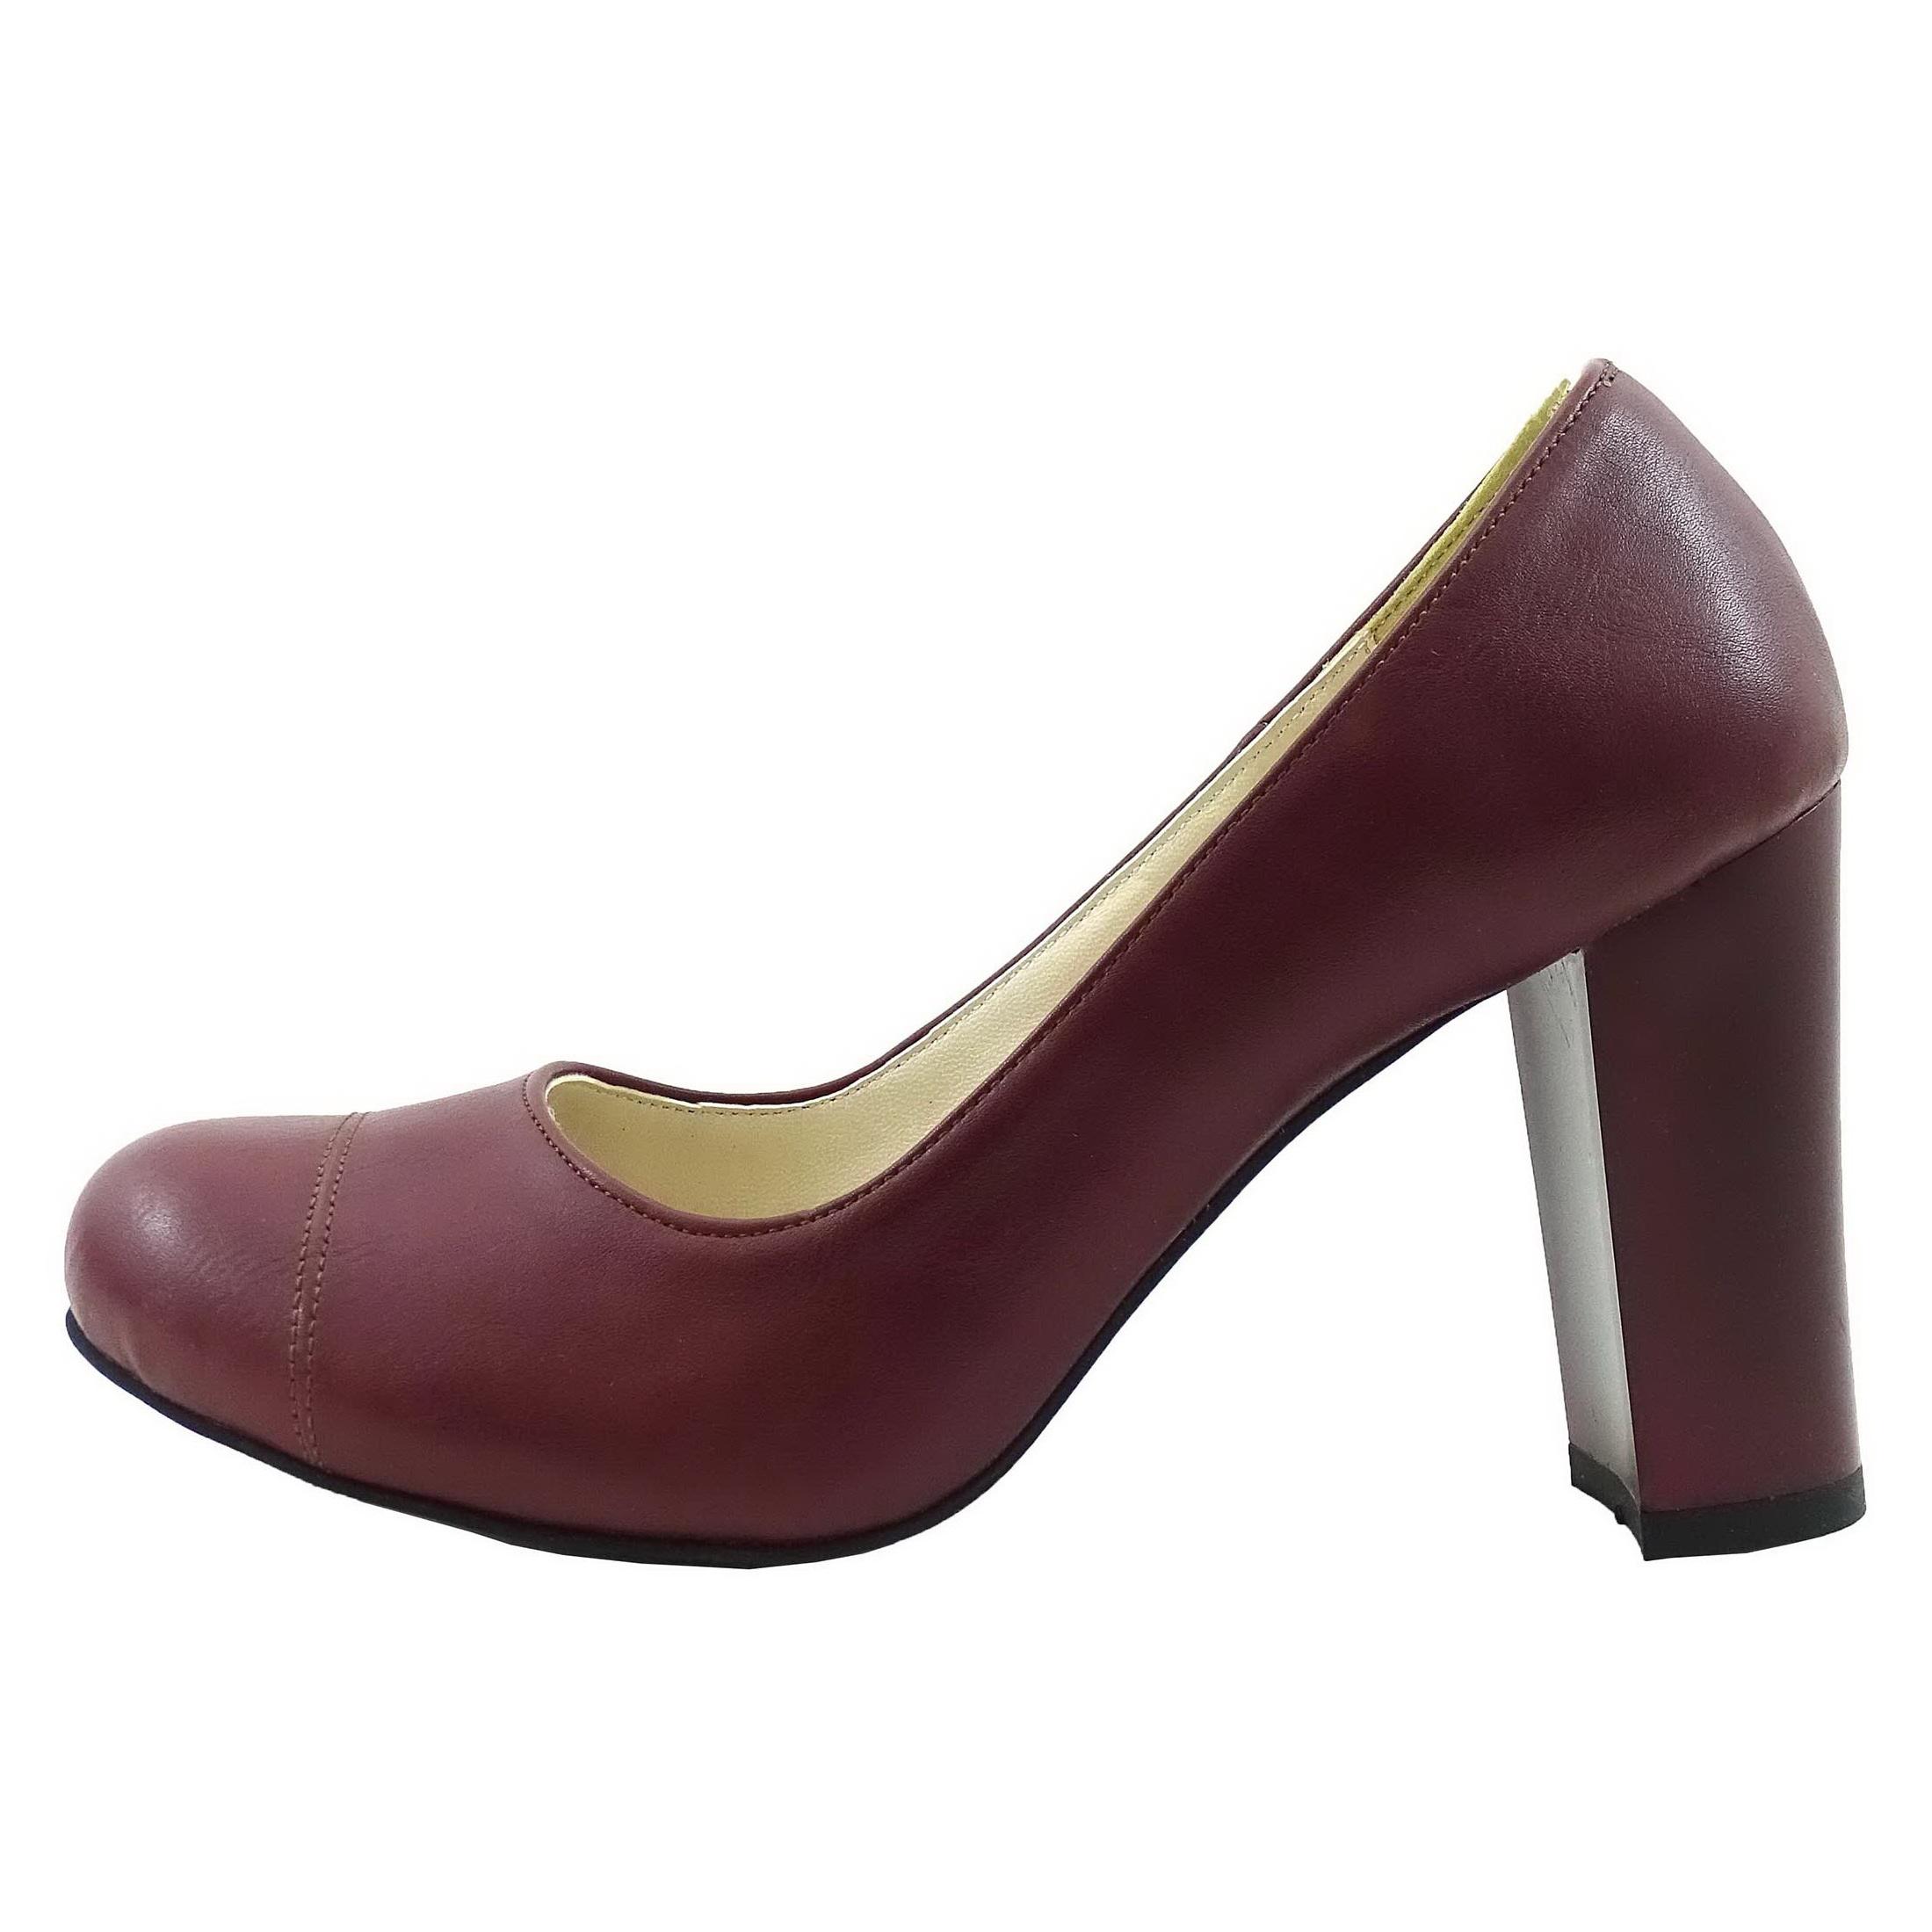 کفش نه آذاردو مدل W00723